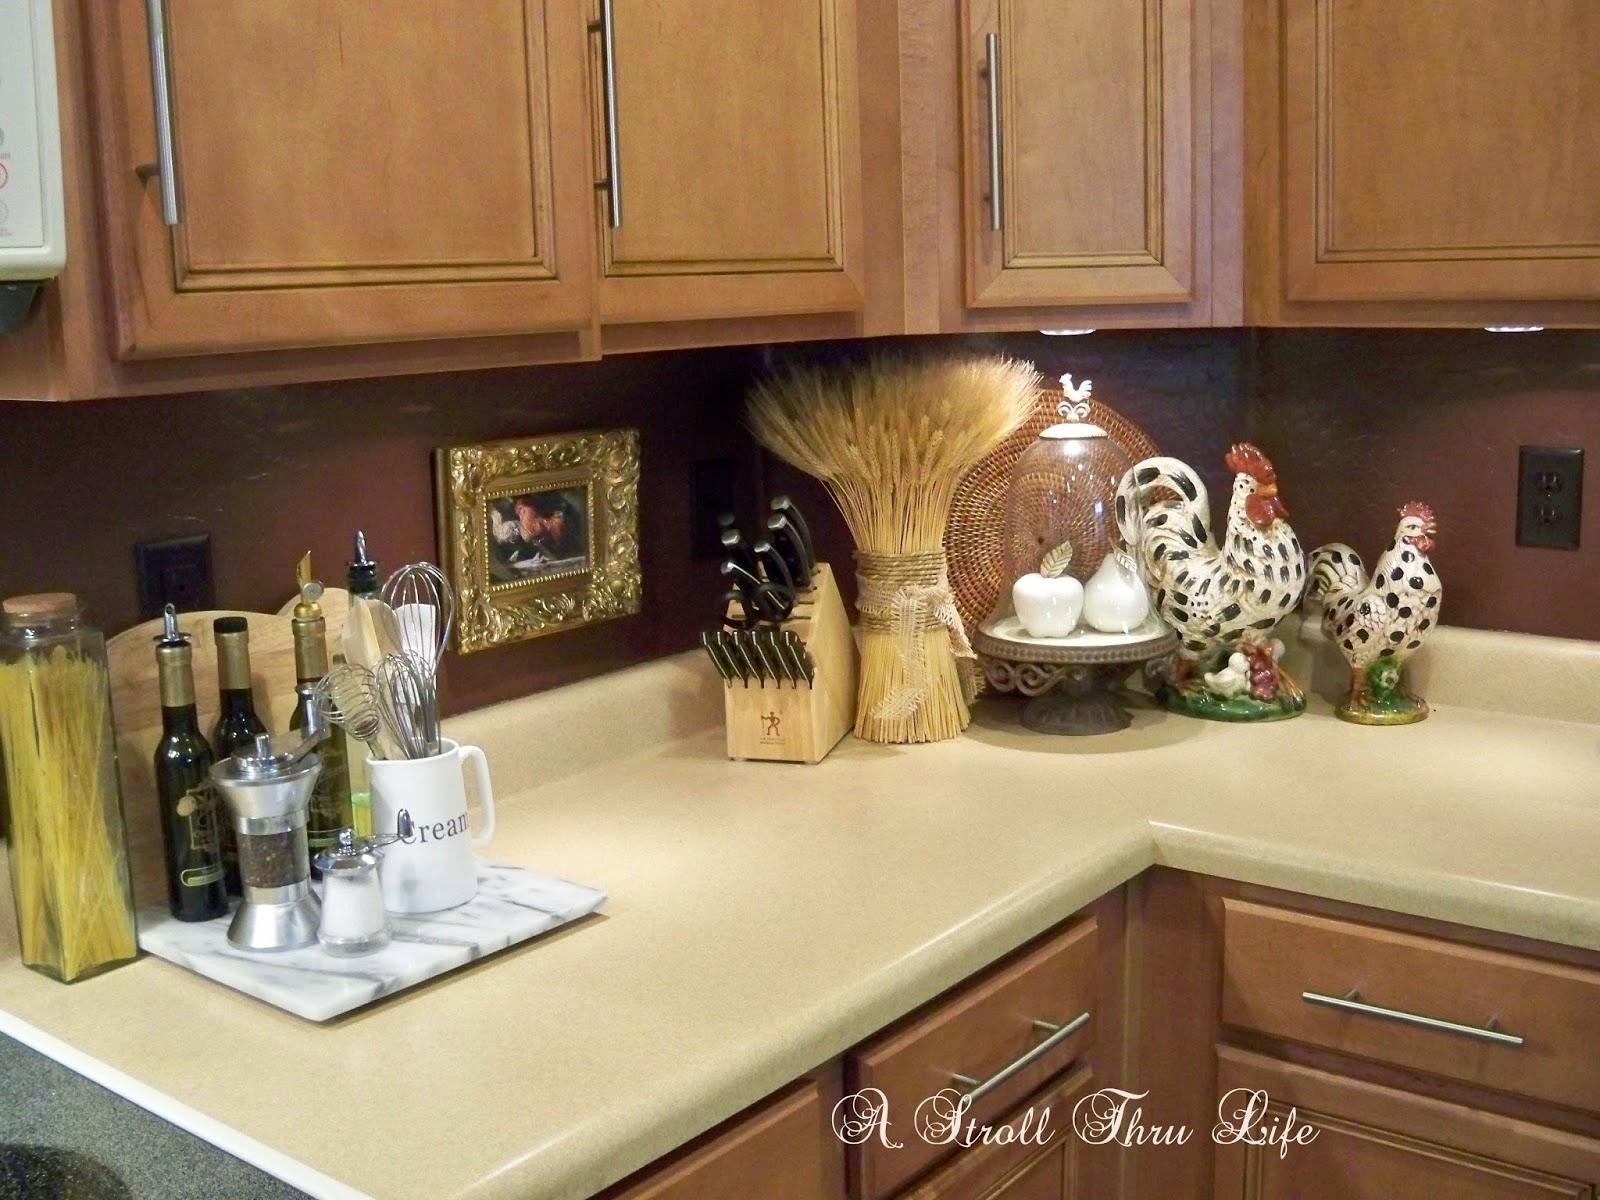 Wonderful Rak's Kitchen That Will Fascinate You